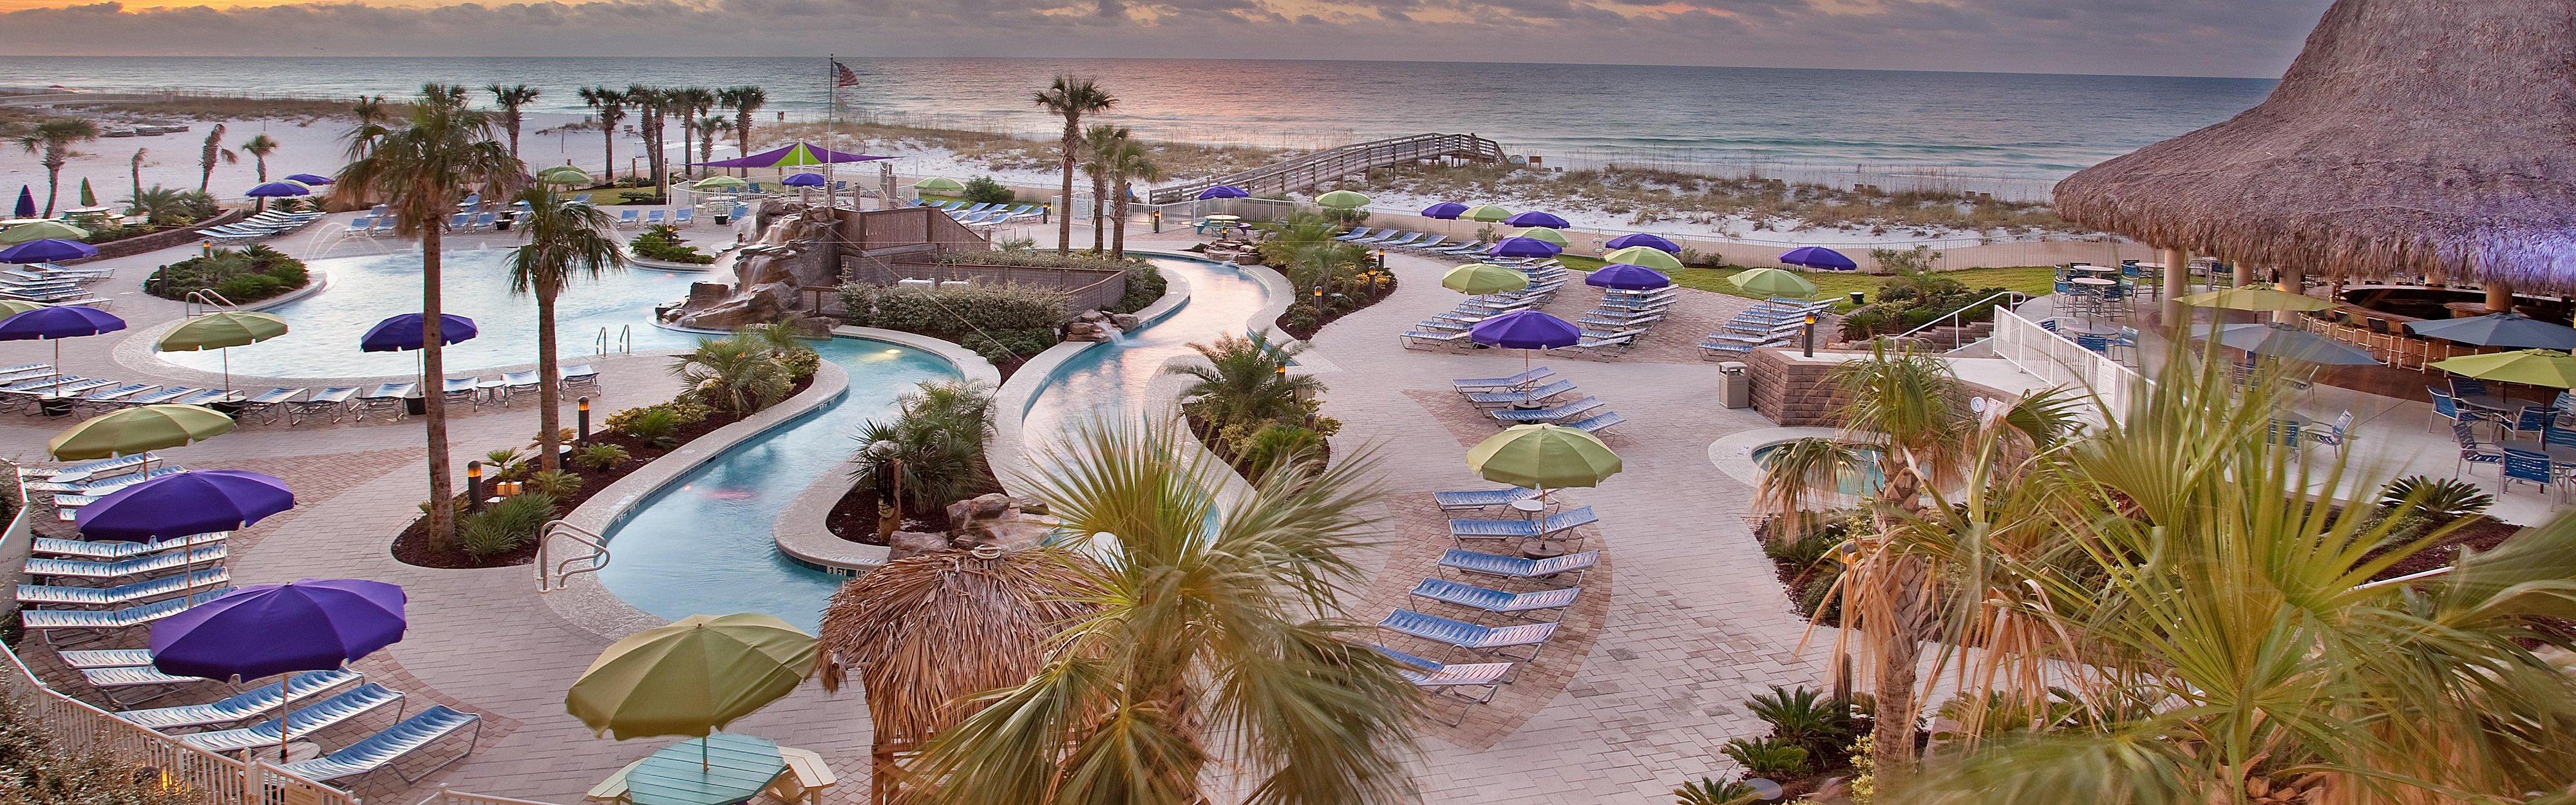 Holiday Inn Resort Pensacola Beach Gulf Front - Free Internet & More